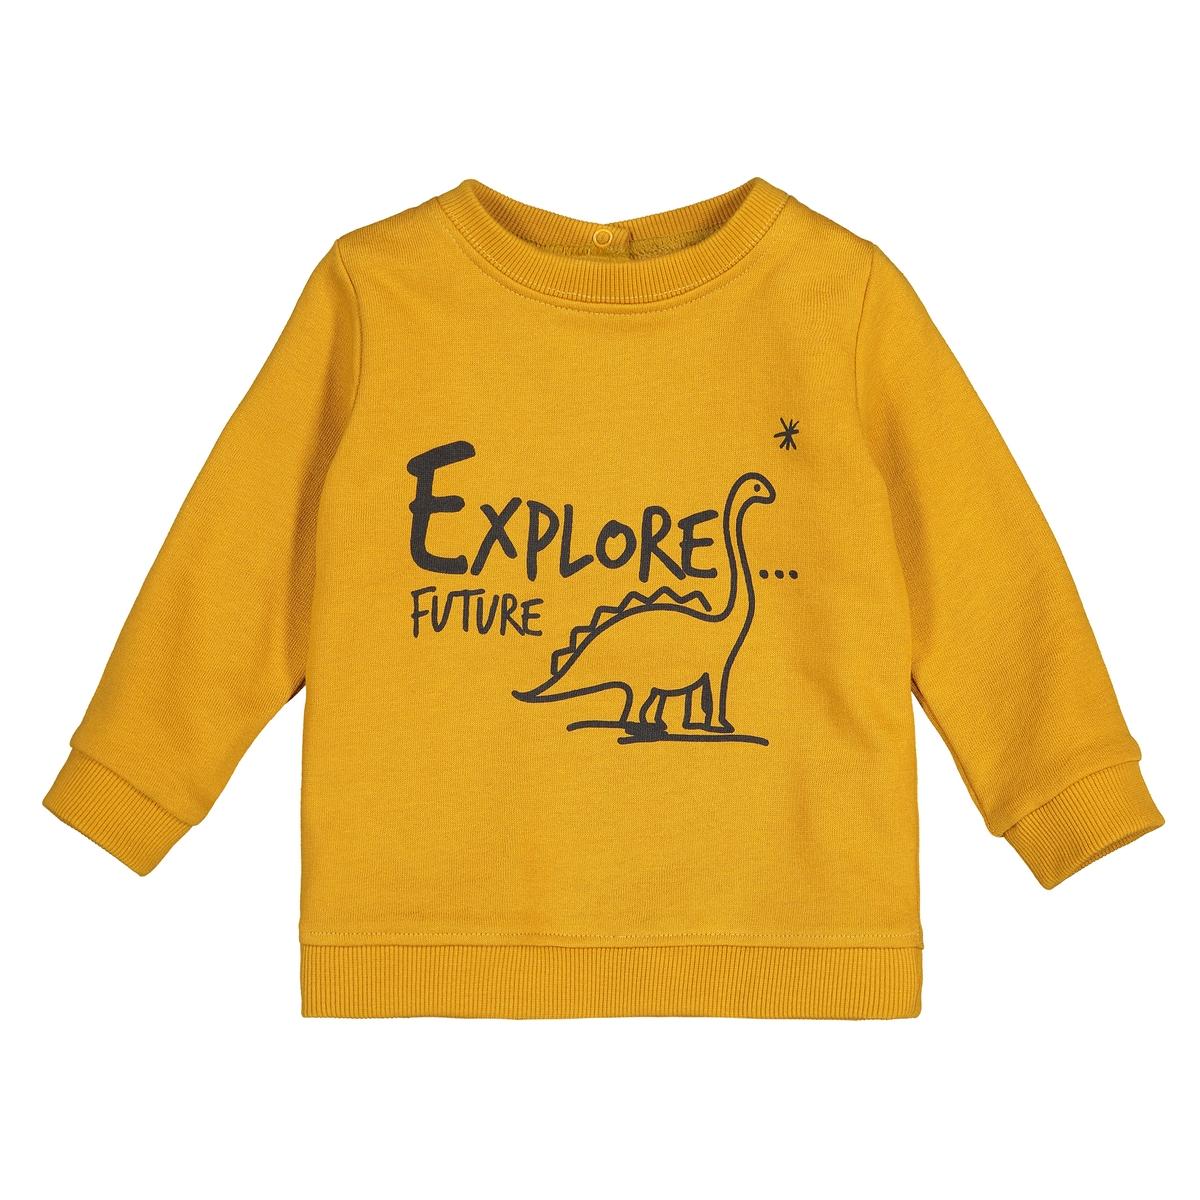 Свитшот La Redoute Из мольтона с принтом динозавр мес- года 1 мес. - 54 см желтый футболка с принтом 1 мес 4 лет